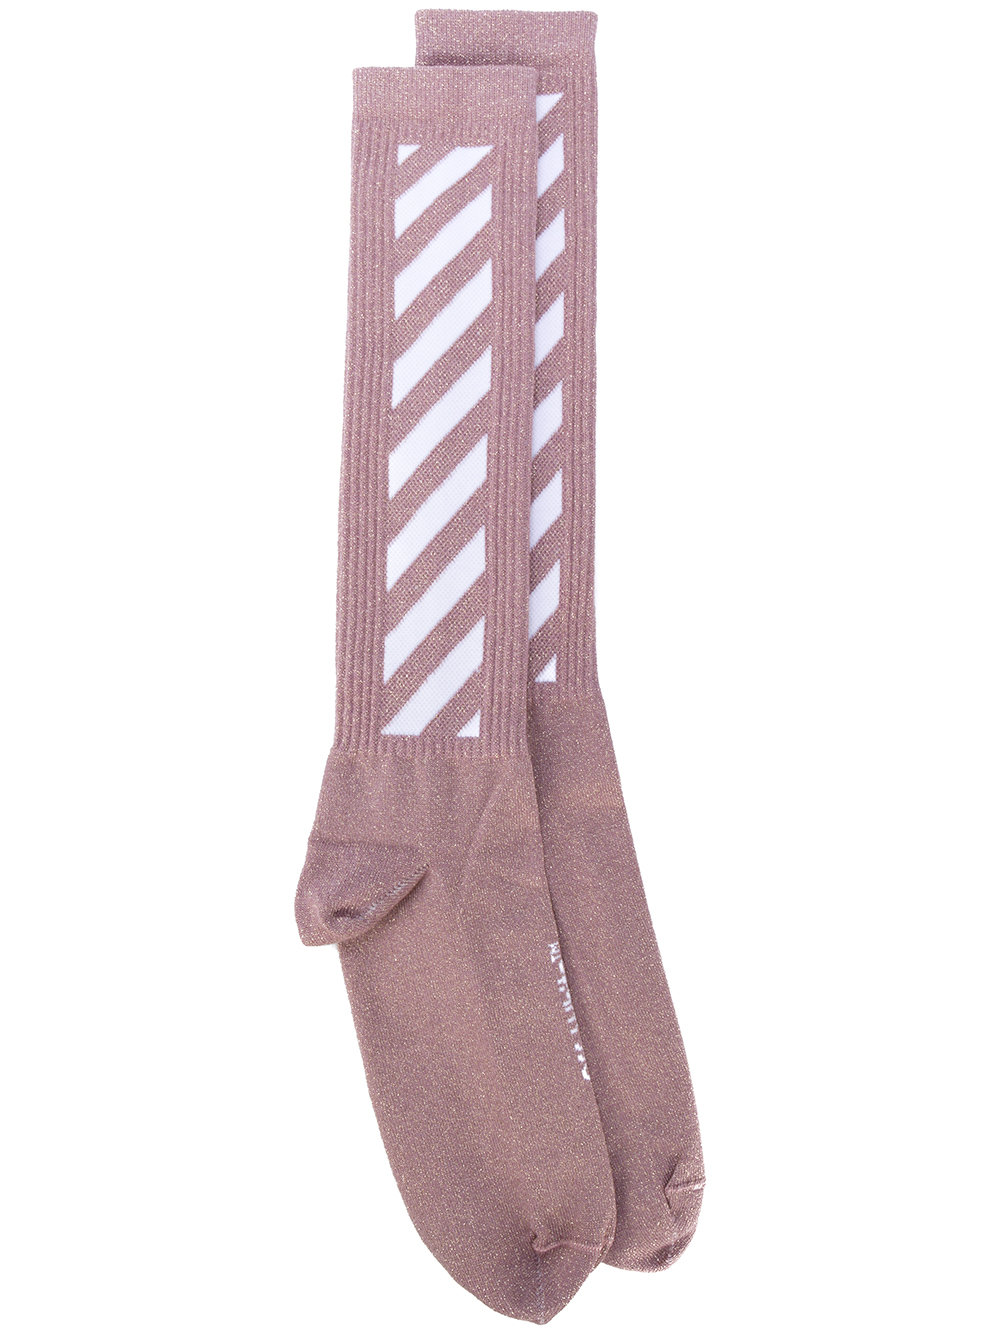 Мода. Носки. OFF-WHITE diagonal stripes socks, 4684₽